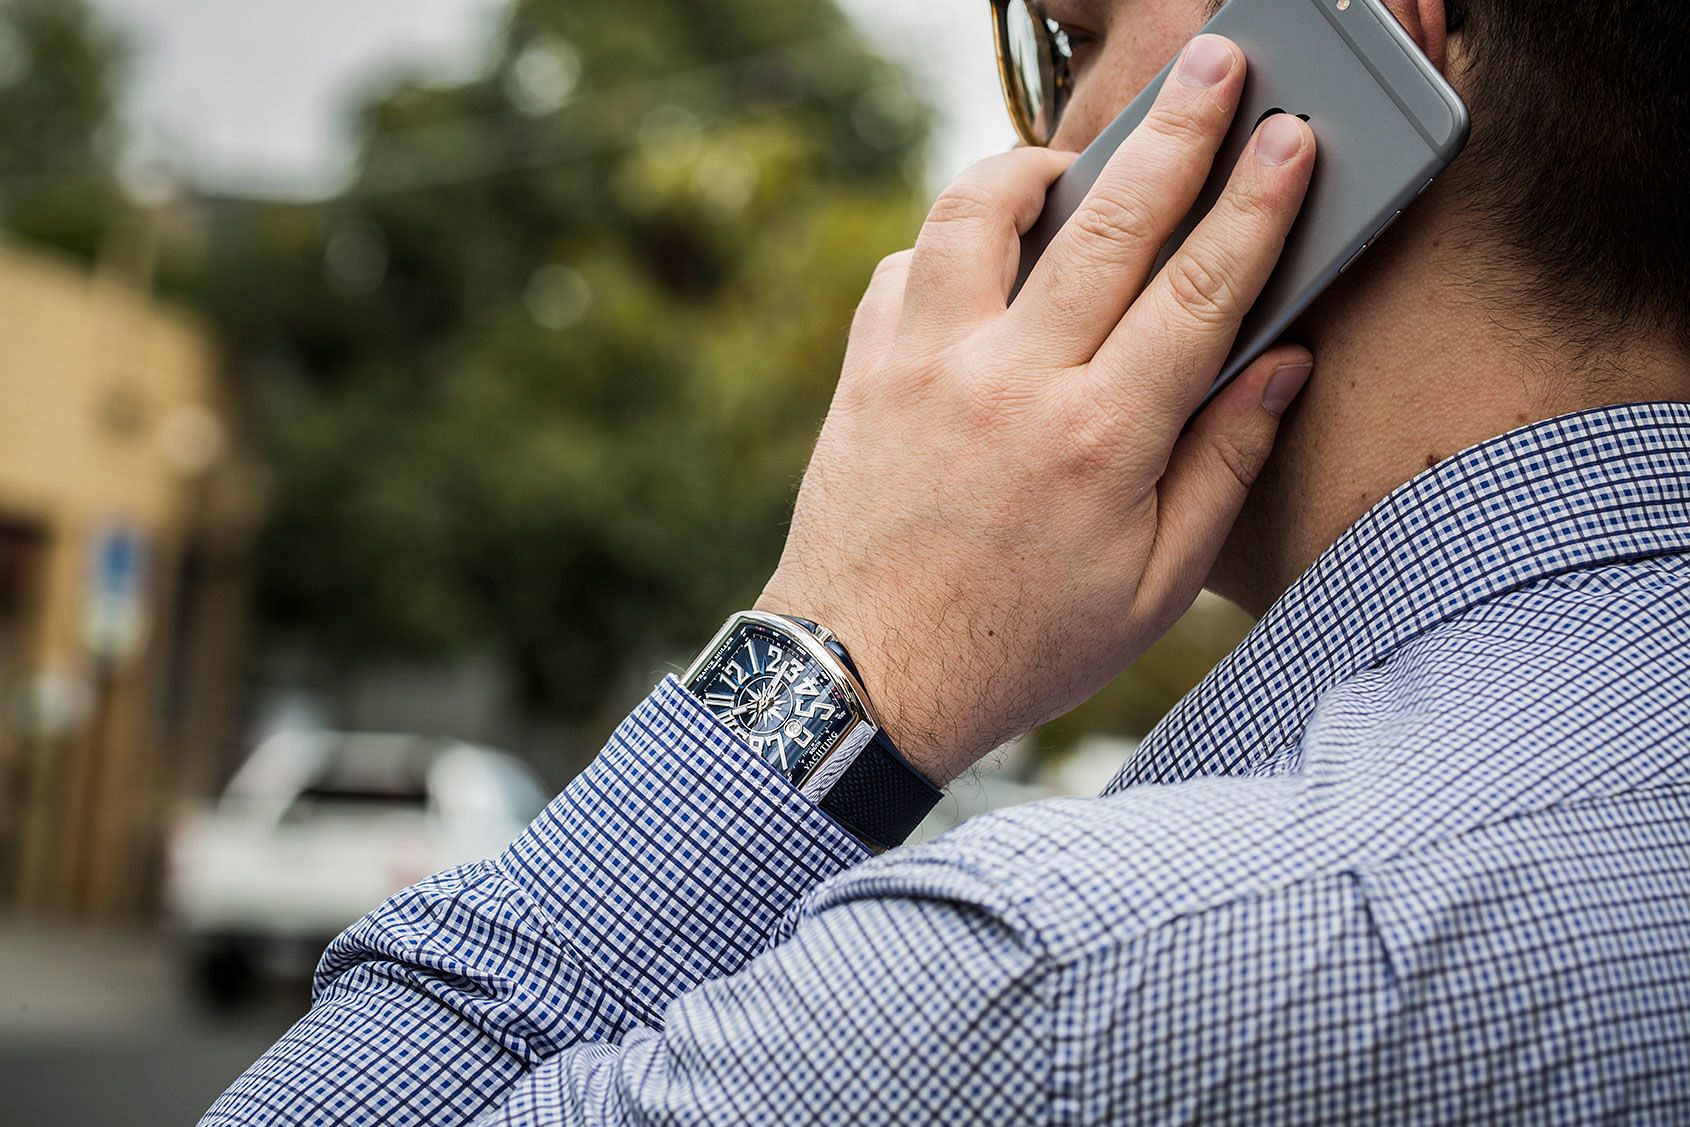 Franck Muller Yachting Vanguard replica watches